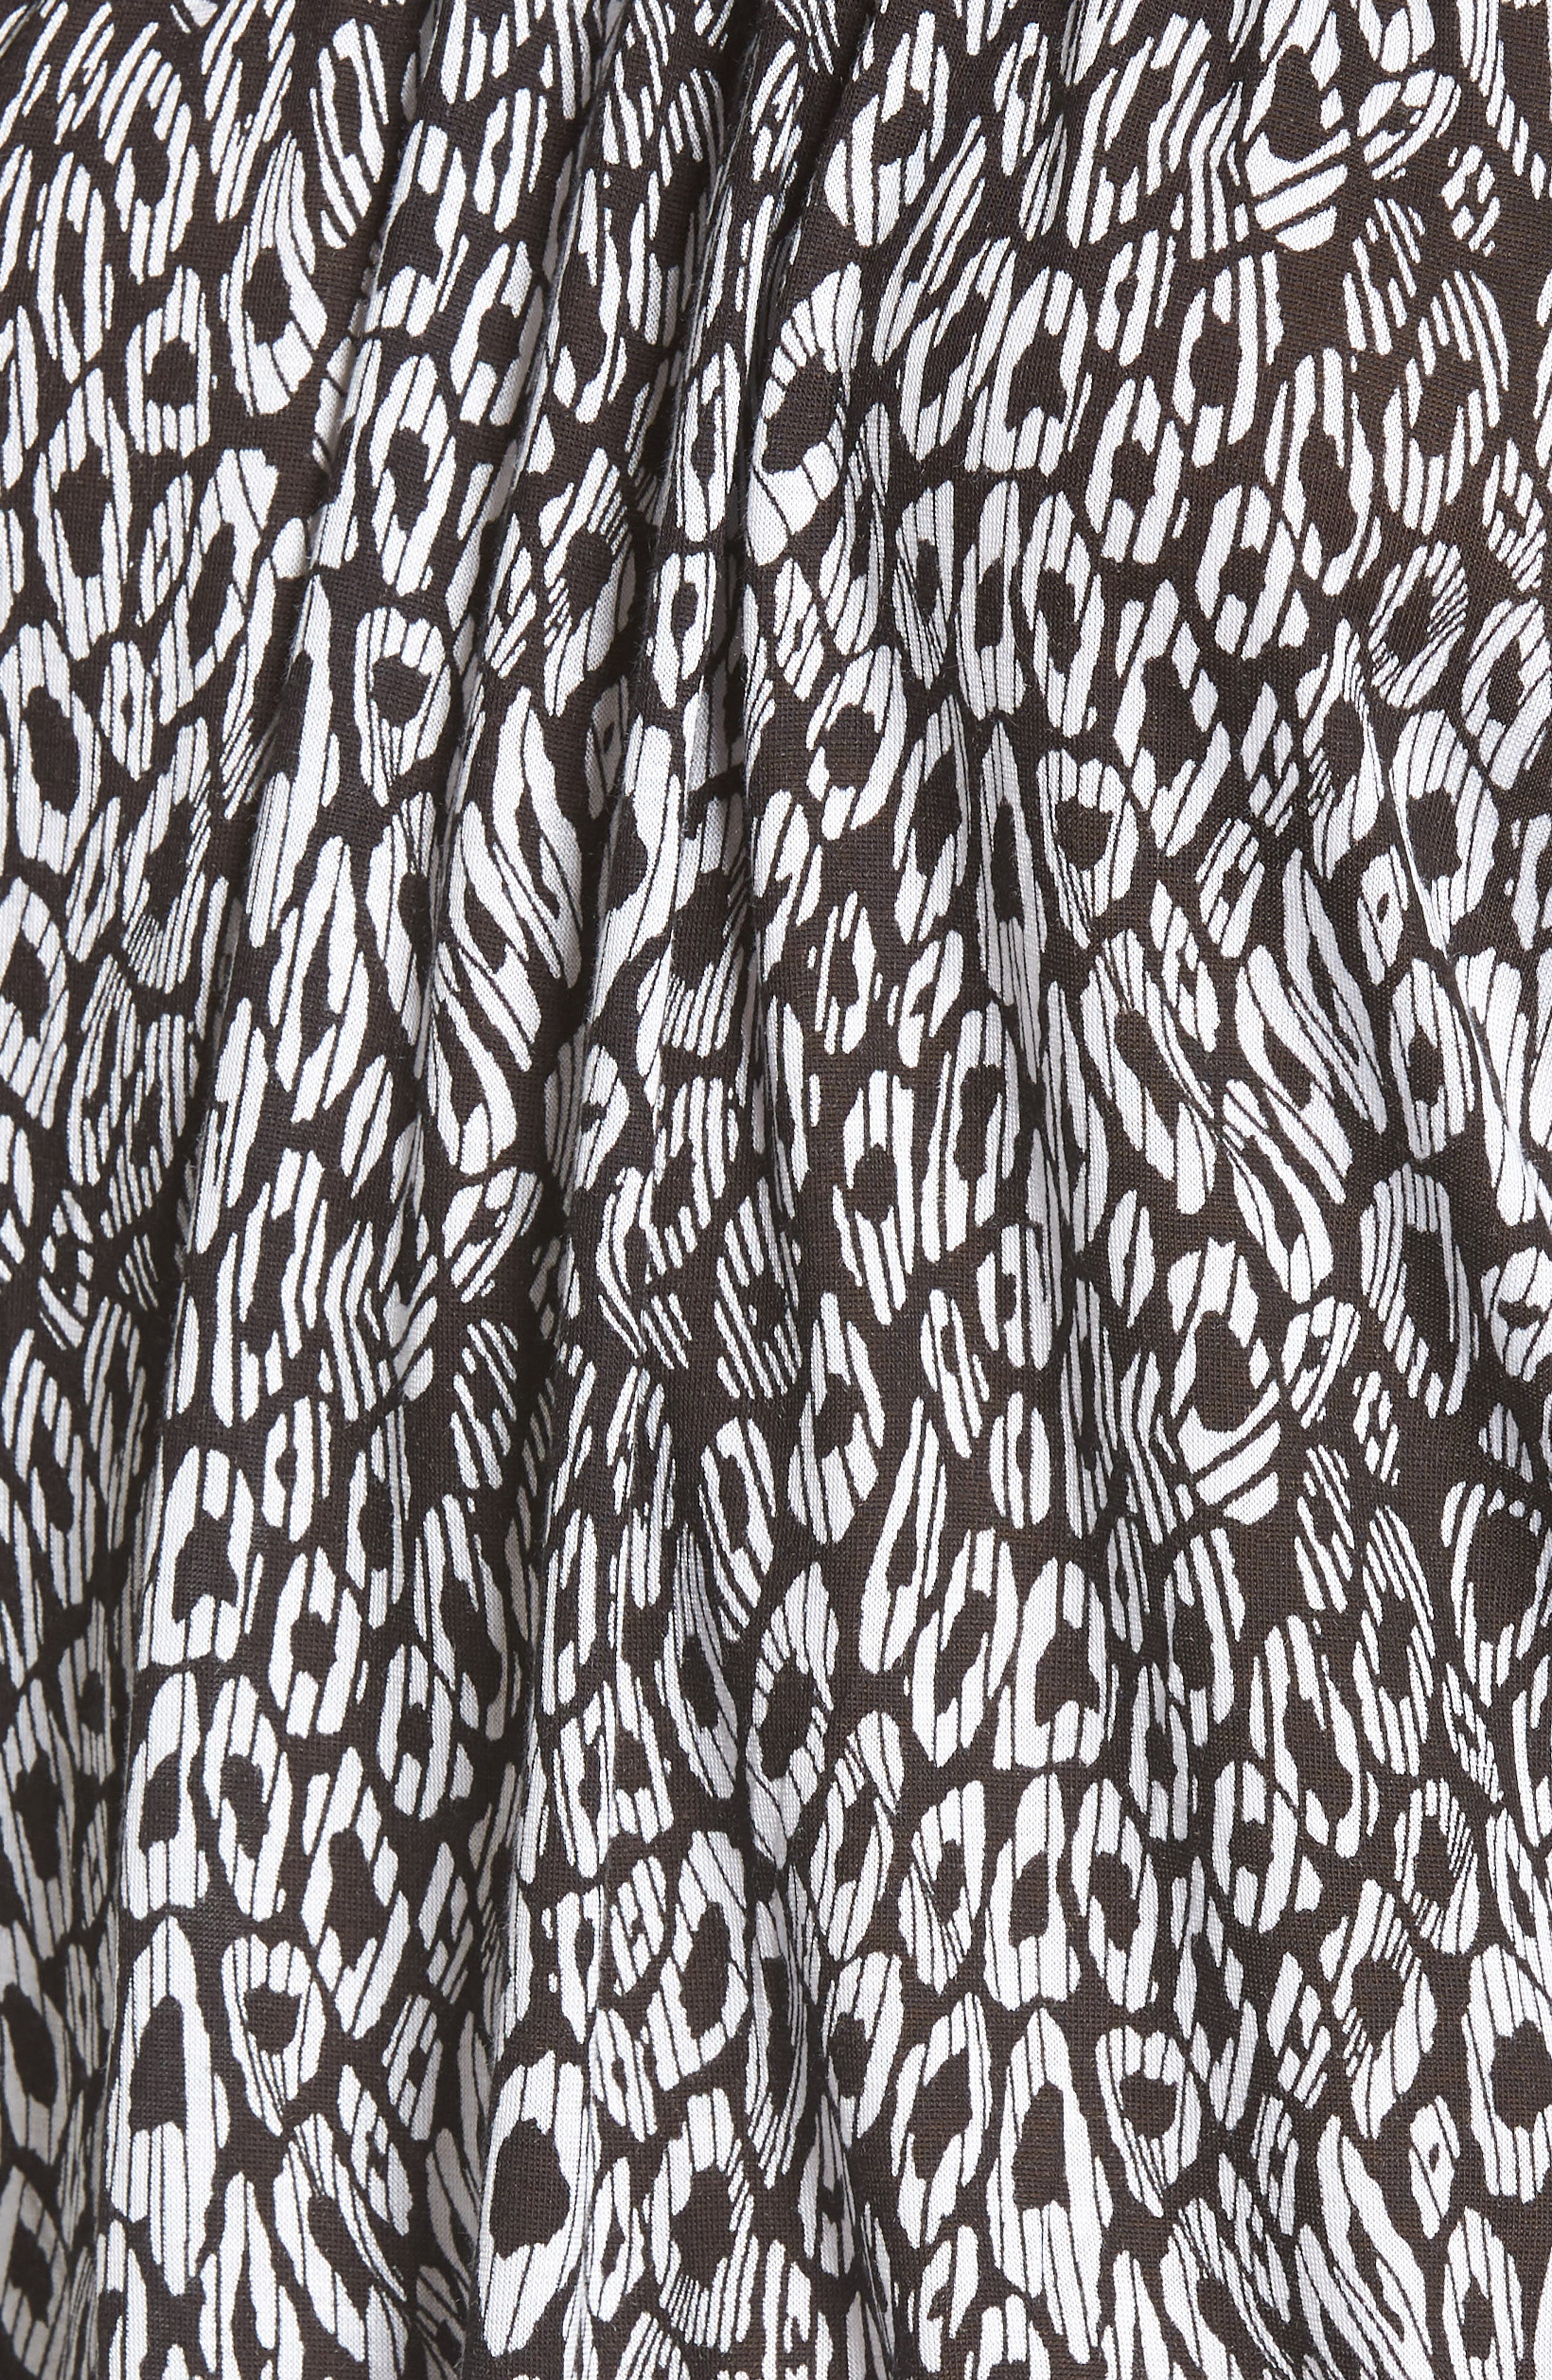 Wavy Leopard Stripe Peasant Top,                             Alternate thumbnail 6, color,                             Black/ White